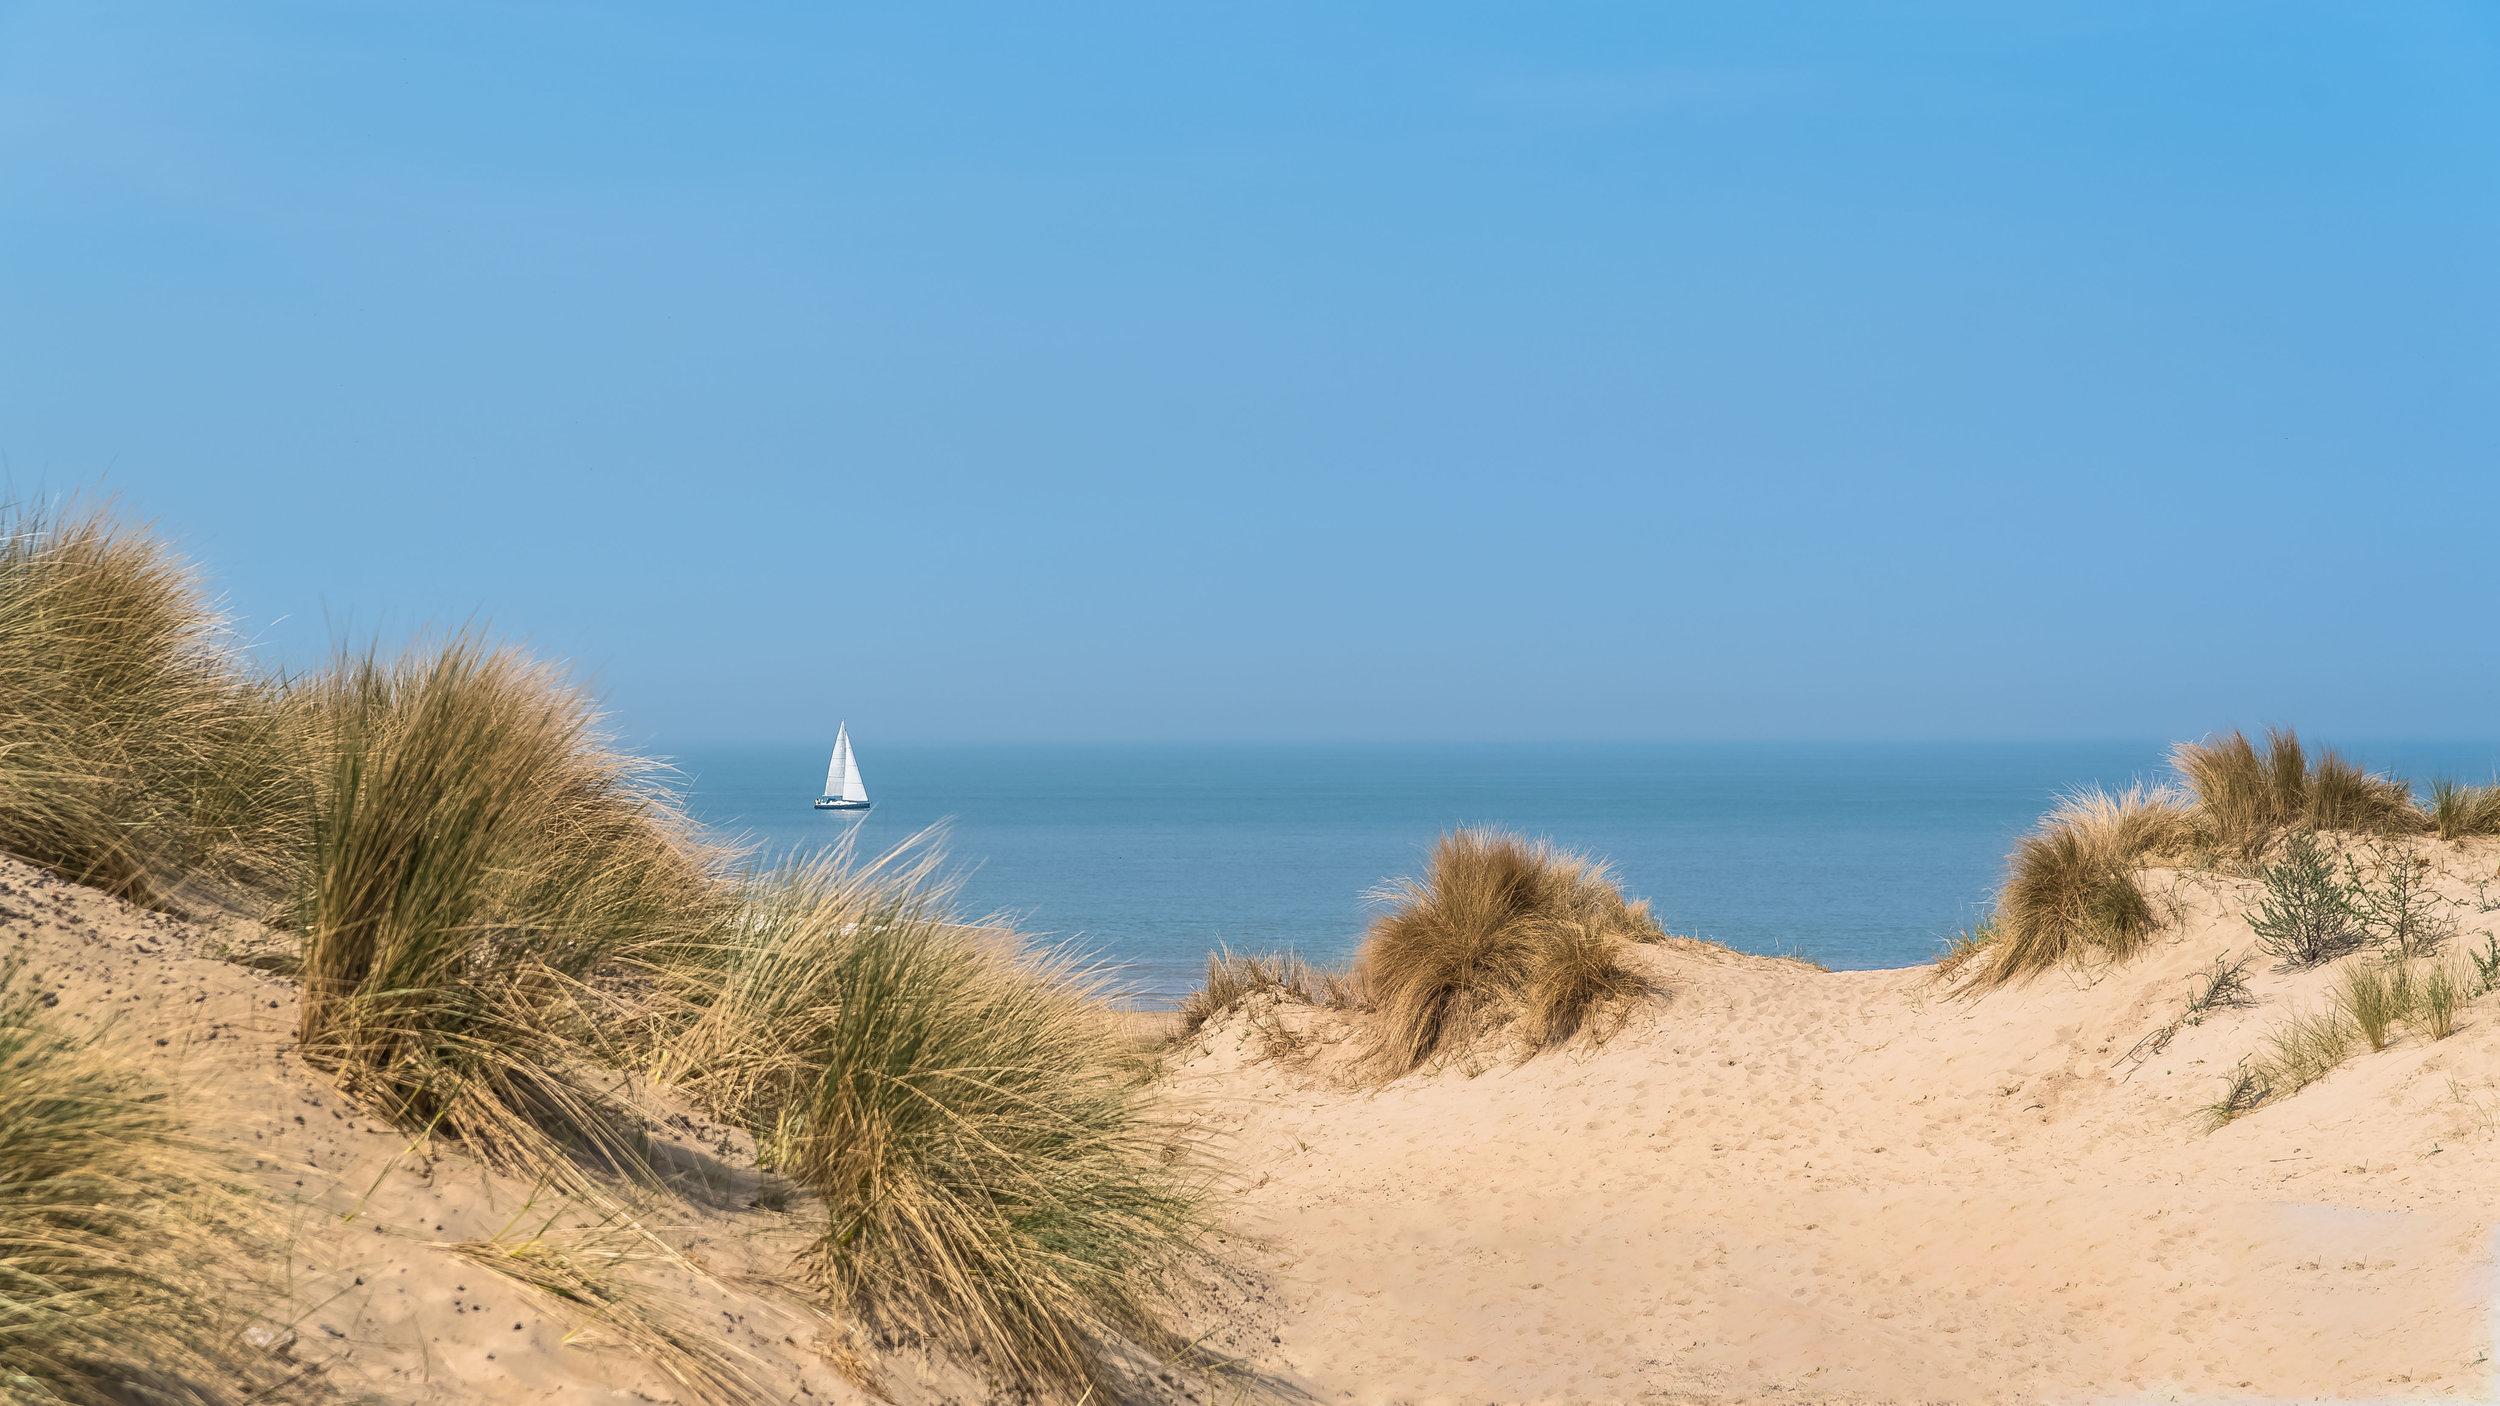 Beach with Sailboat.jpg